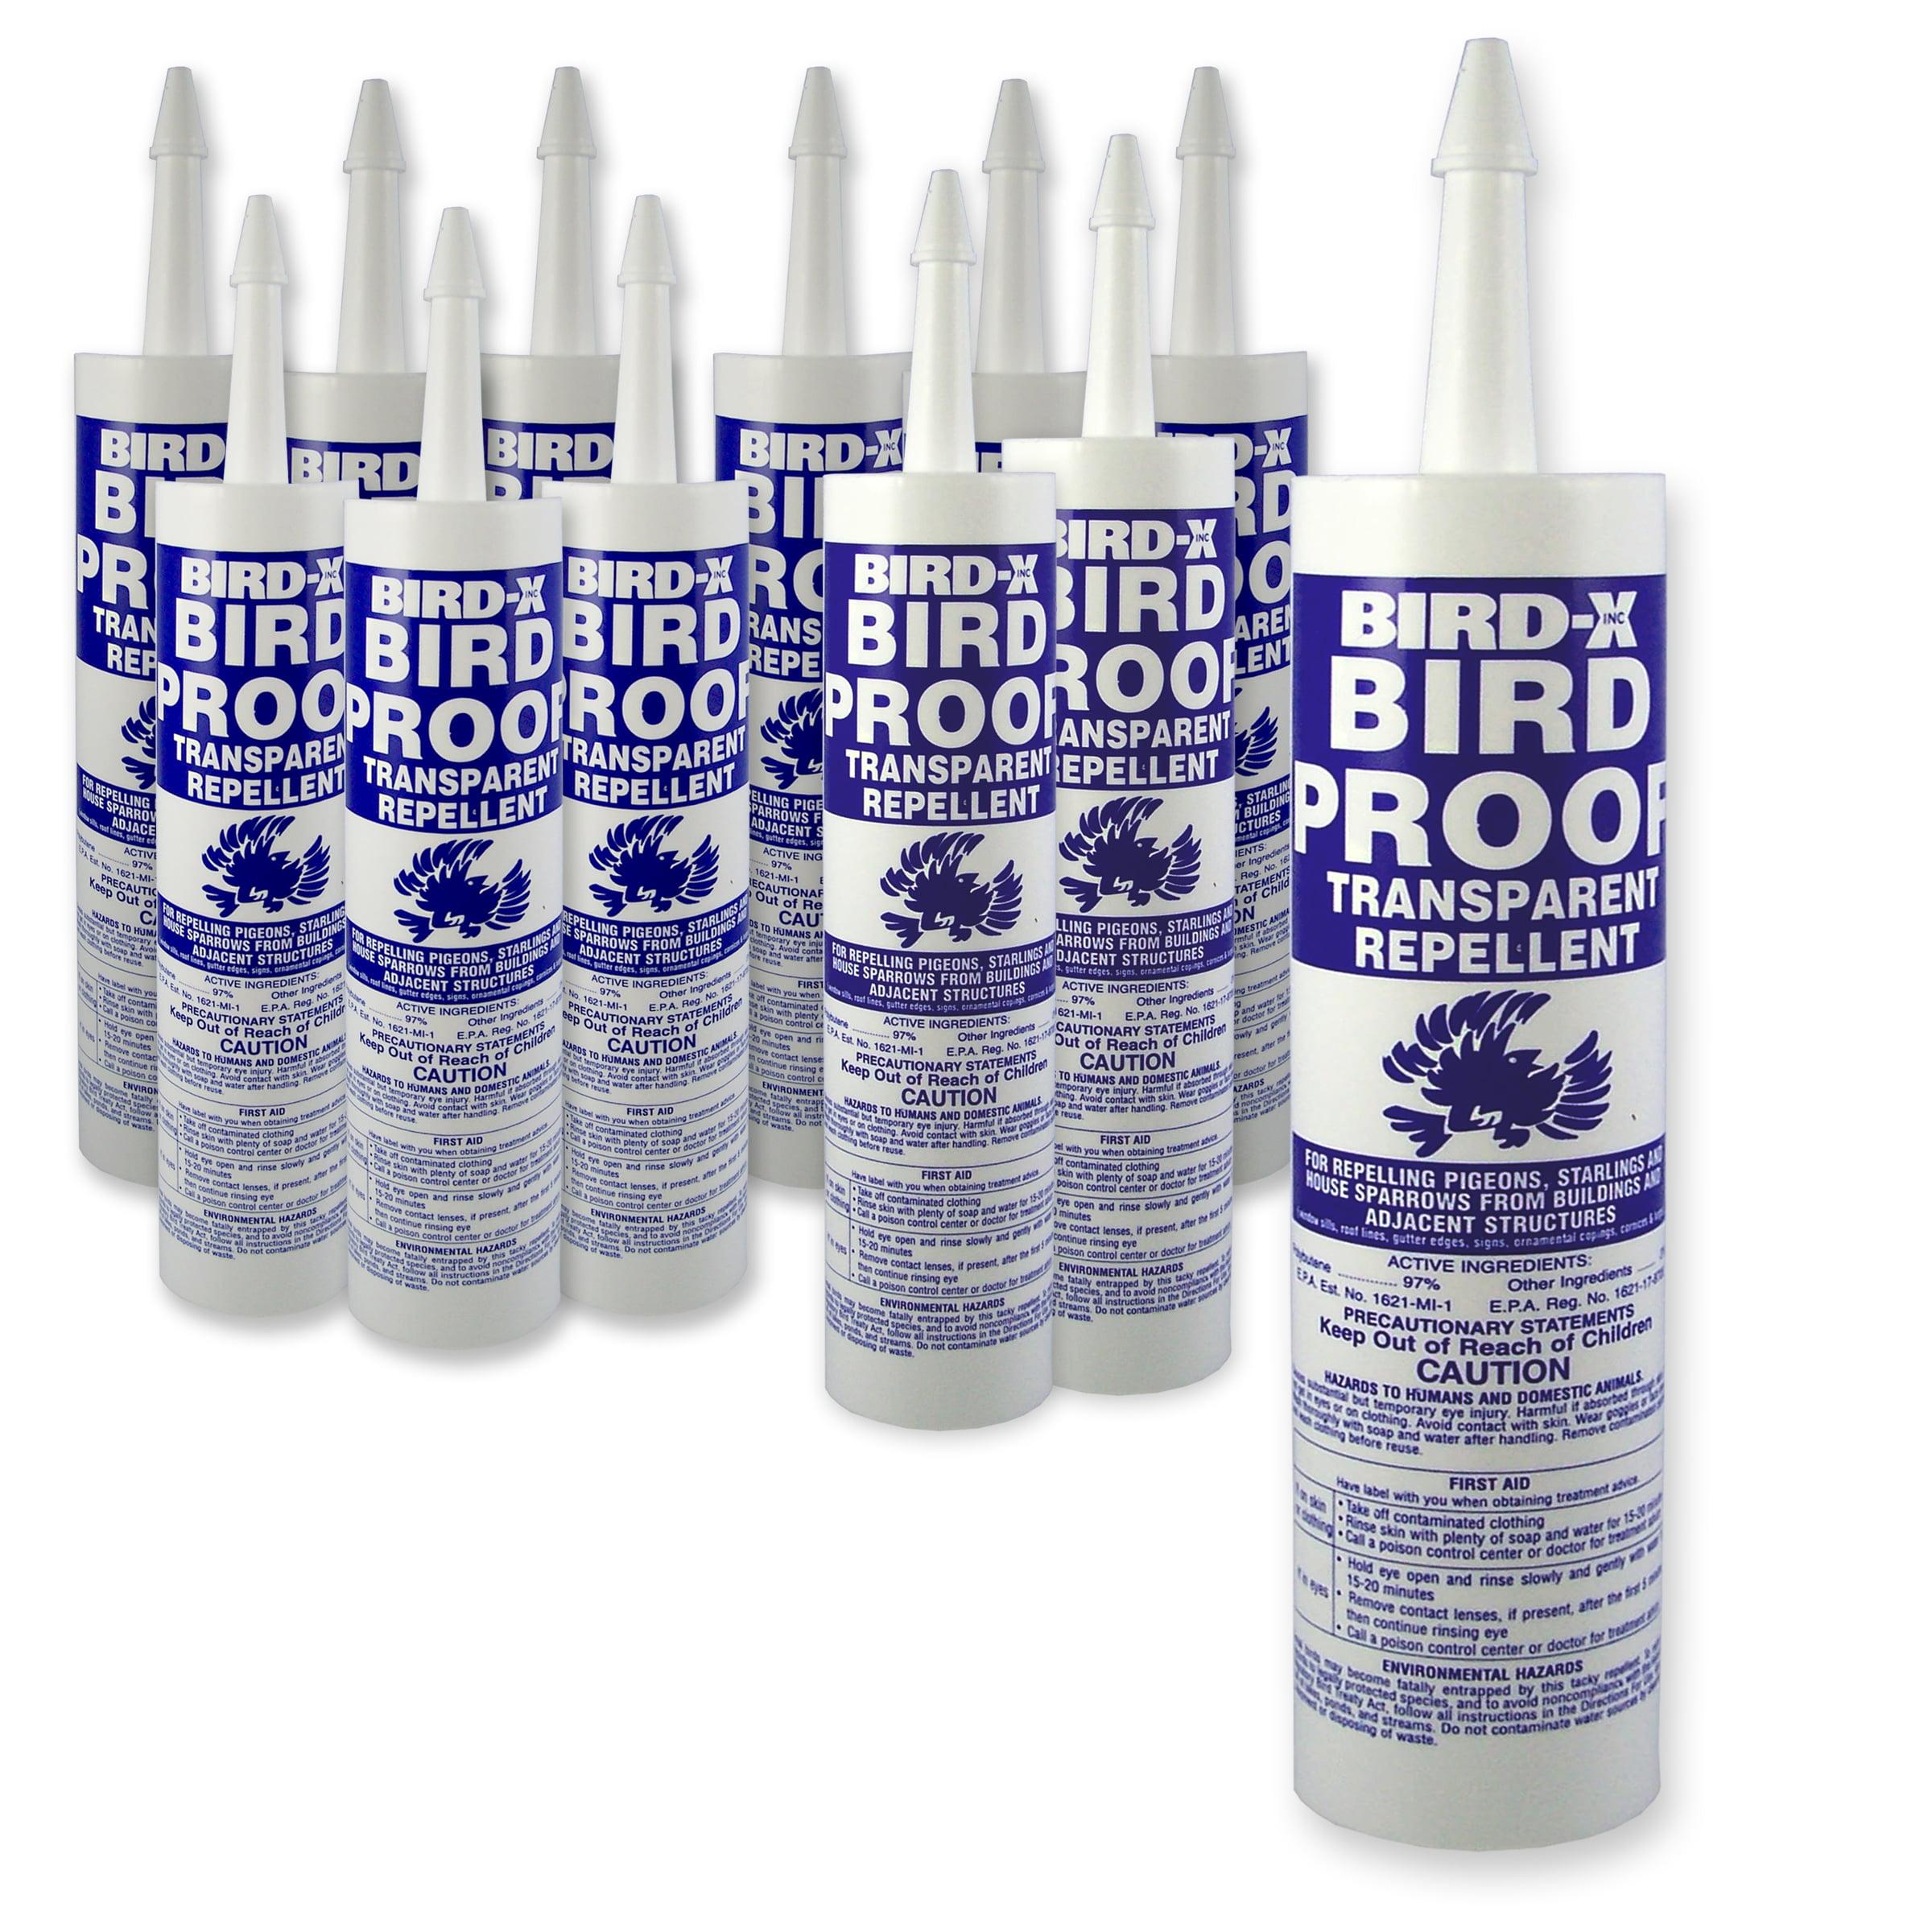 Bird-X Bird Proof Transparent Repellent (12-Pack)